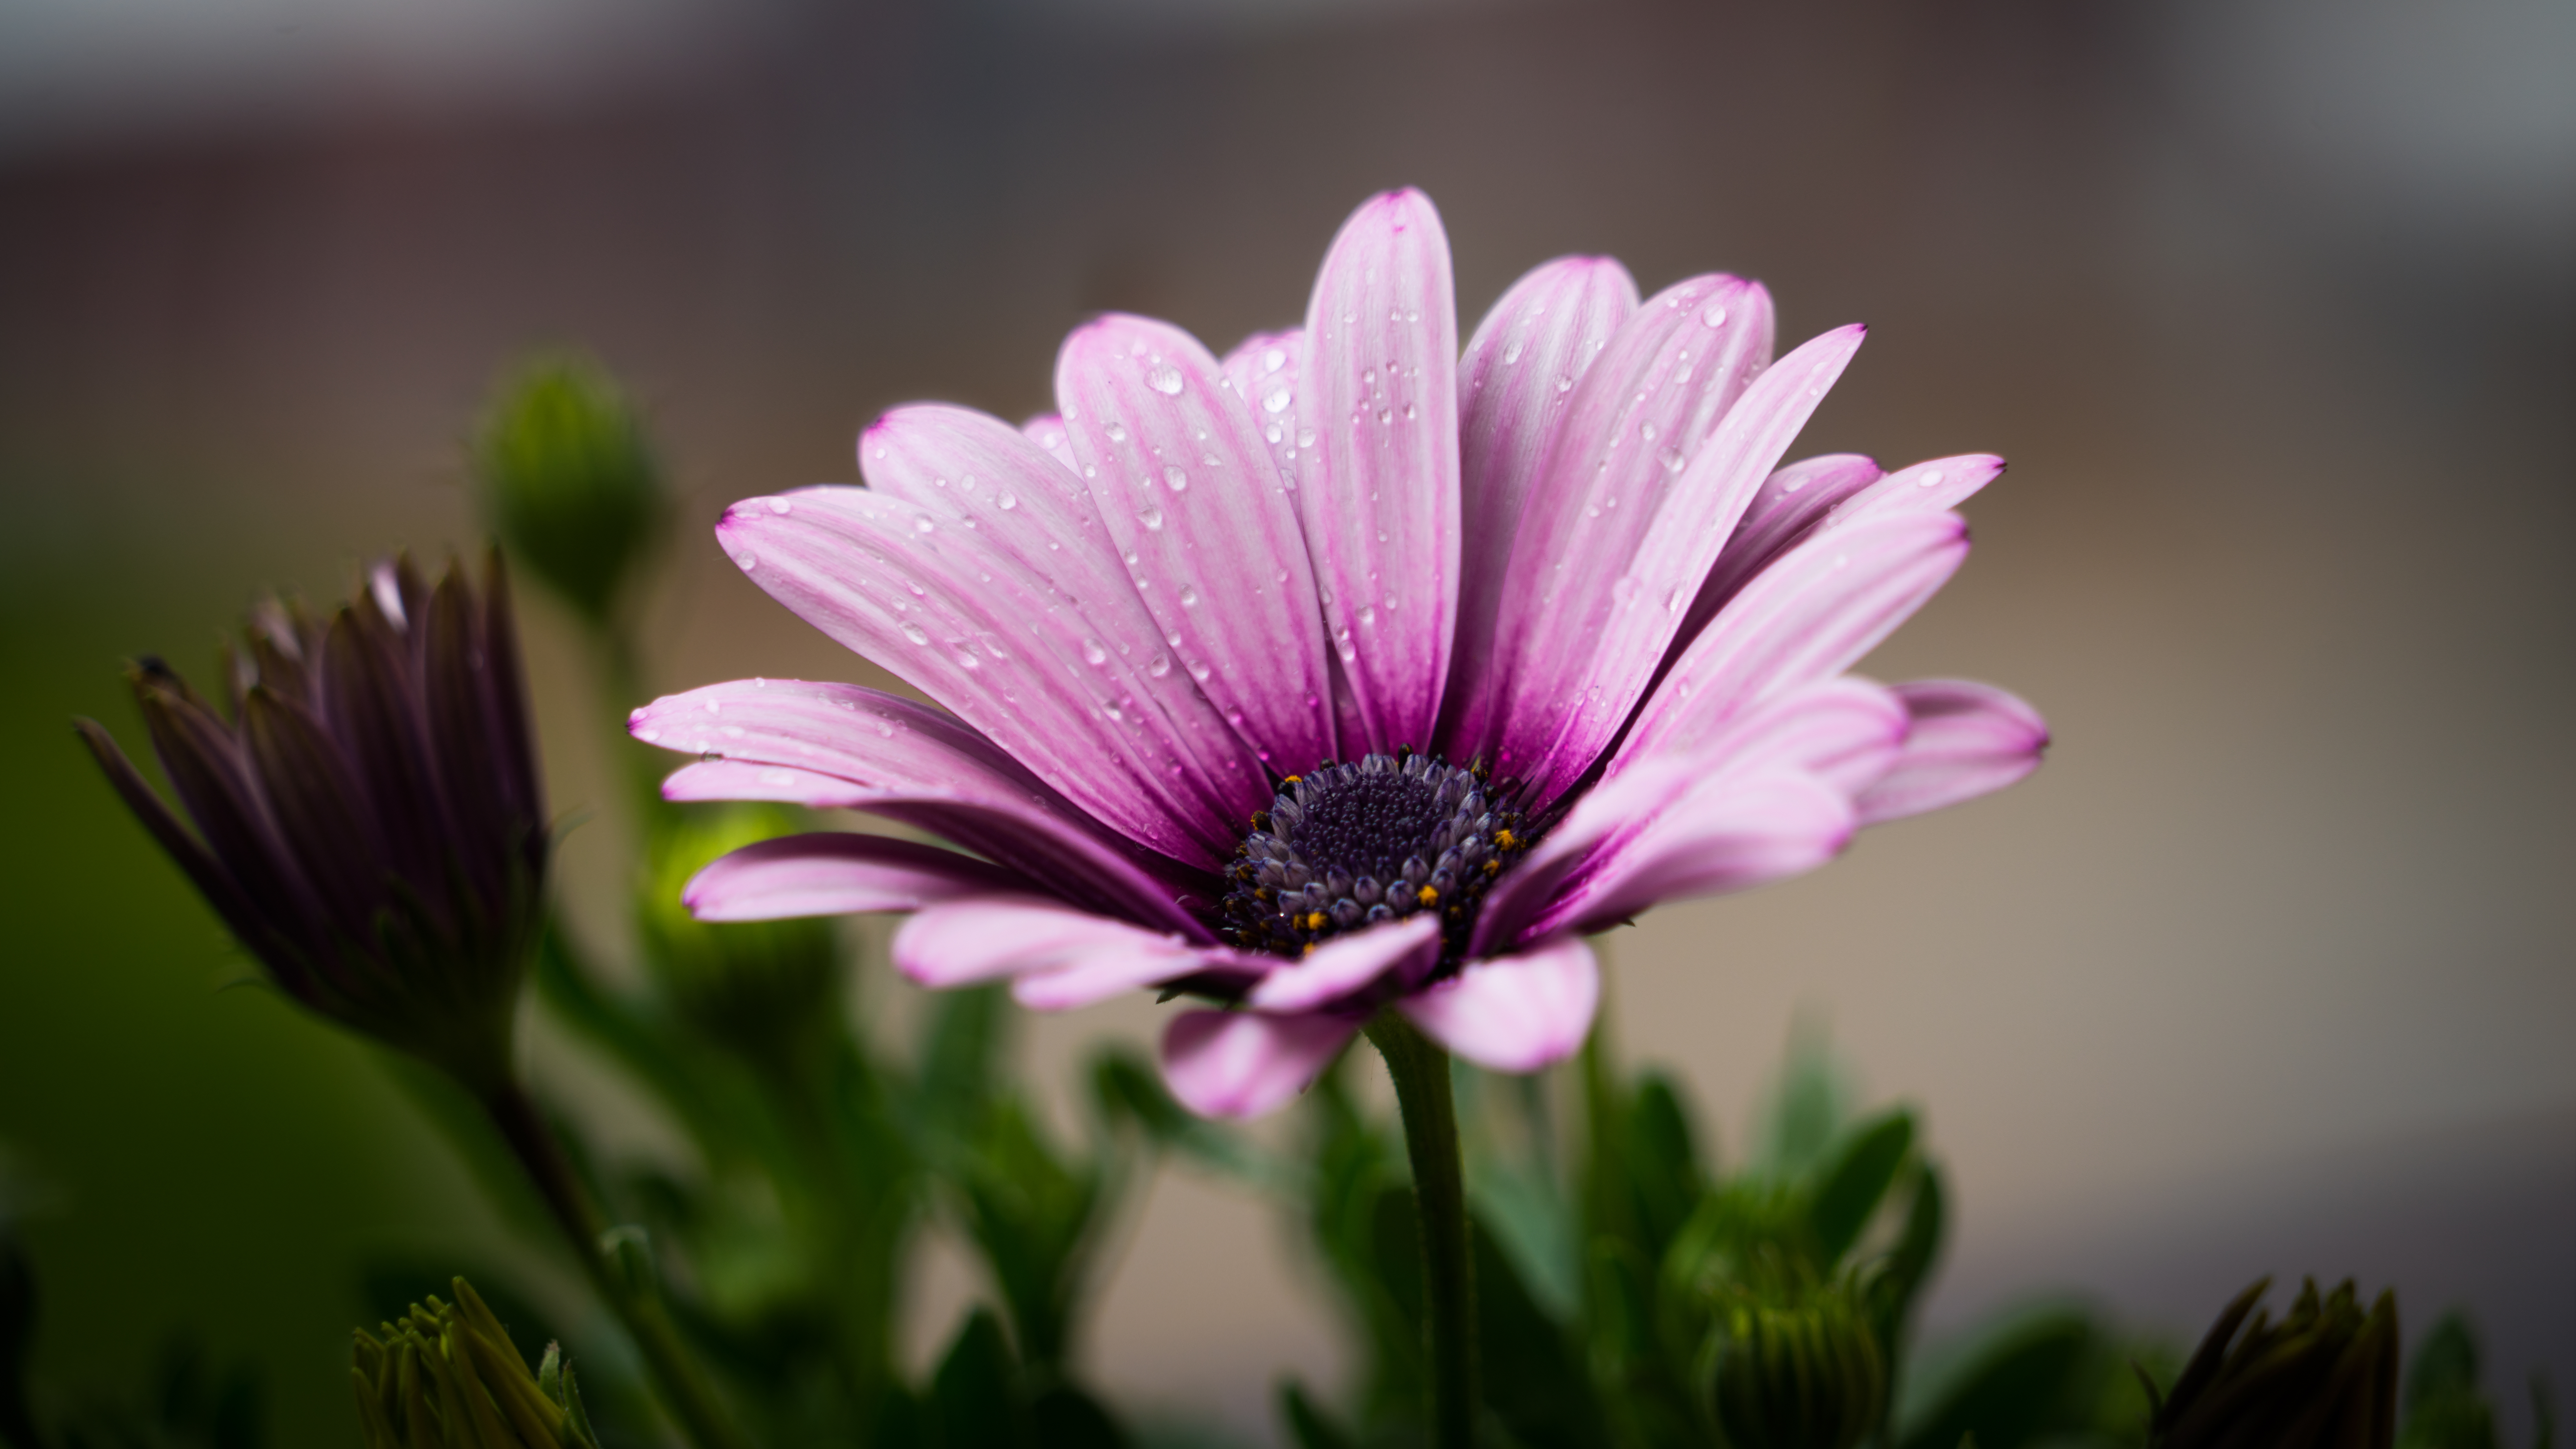 Beautiful Flower Free Stock Photos Life Of Pix